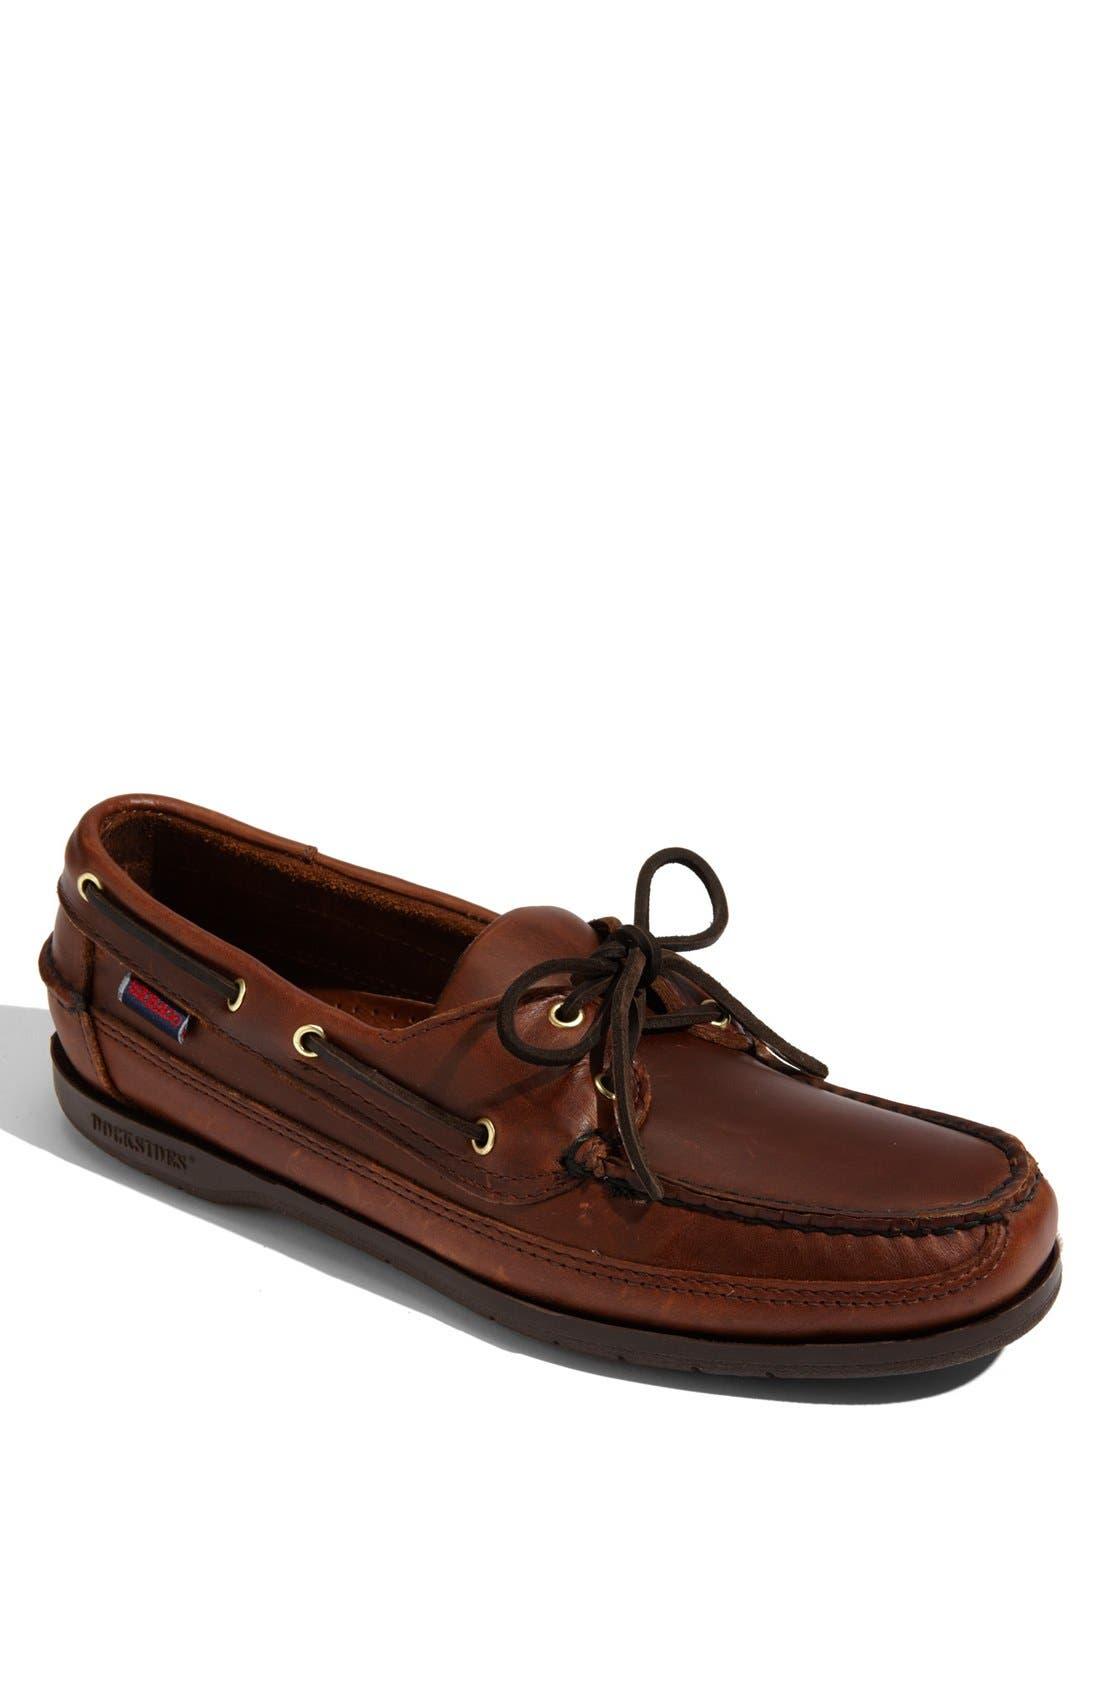 SEBAGO 'Schooner' Boat Shoe